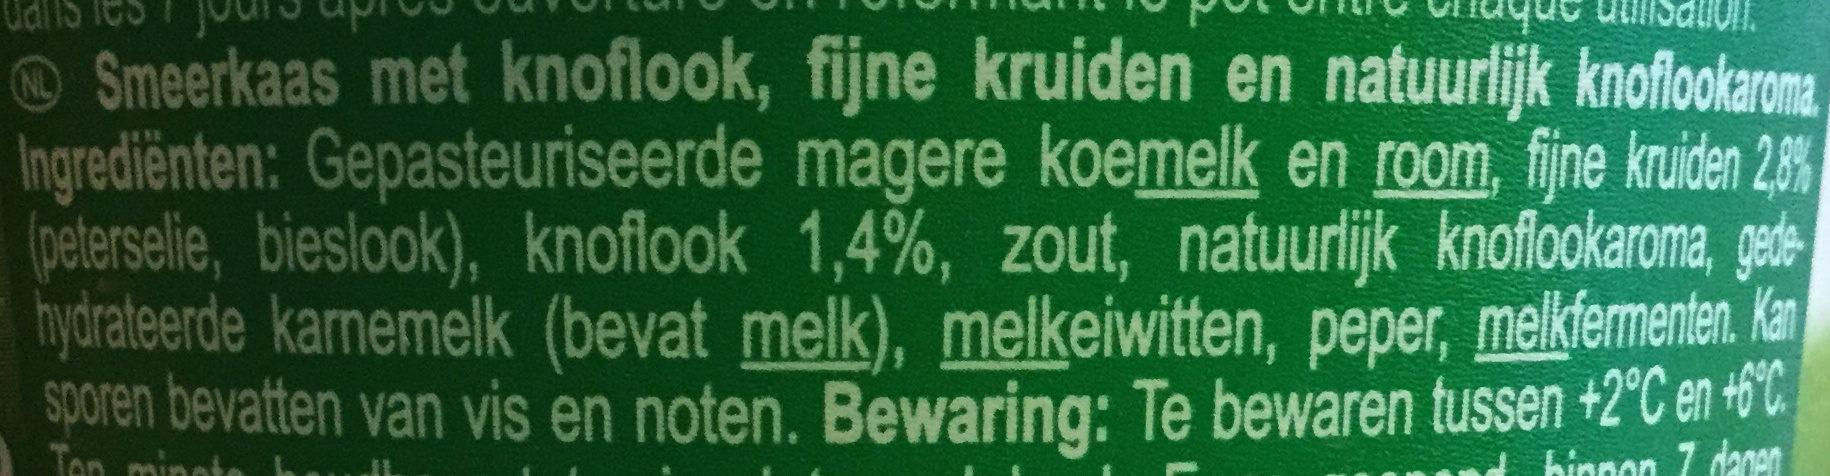 Fromage à tartiner Ail & fines herbes - Ingrediënten - nl